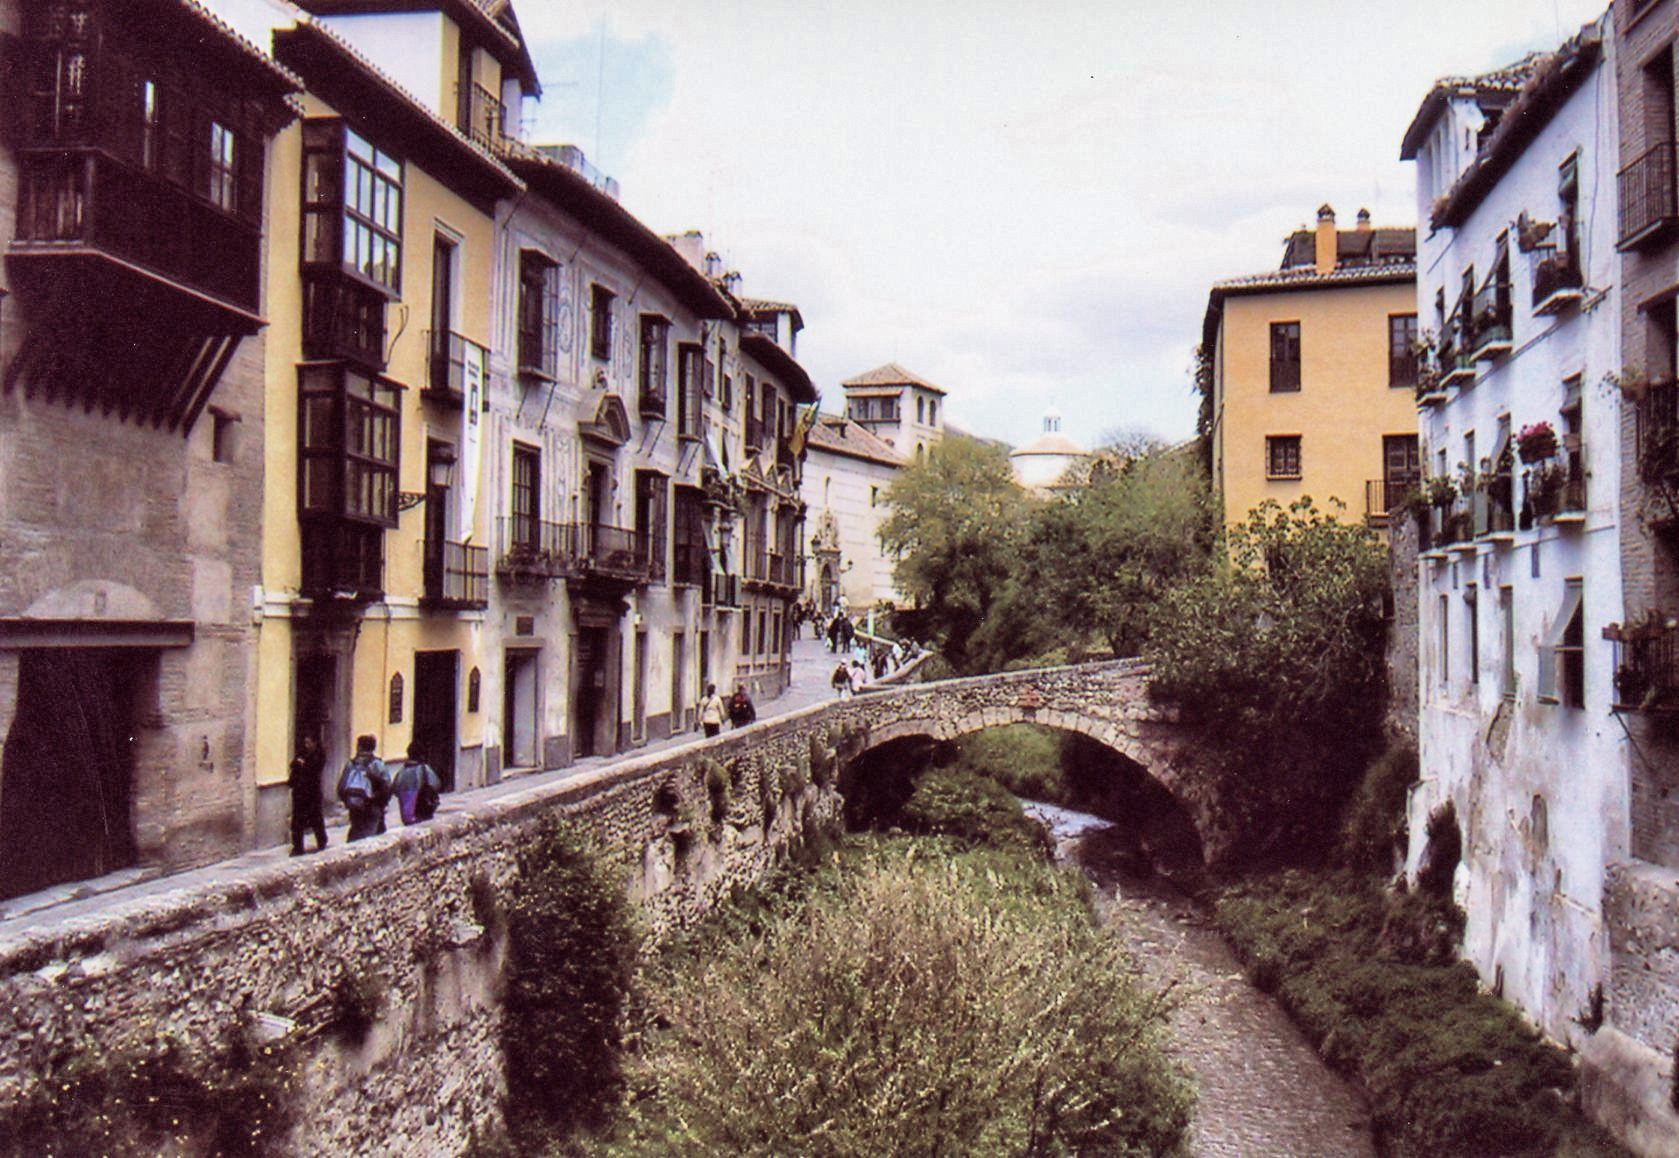 imagen Granada img043 snapseed